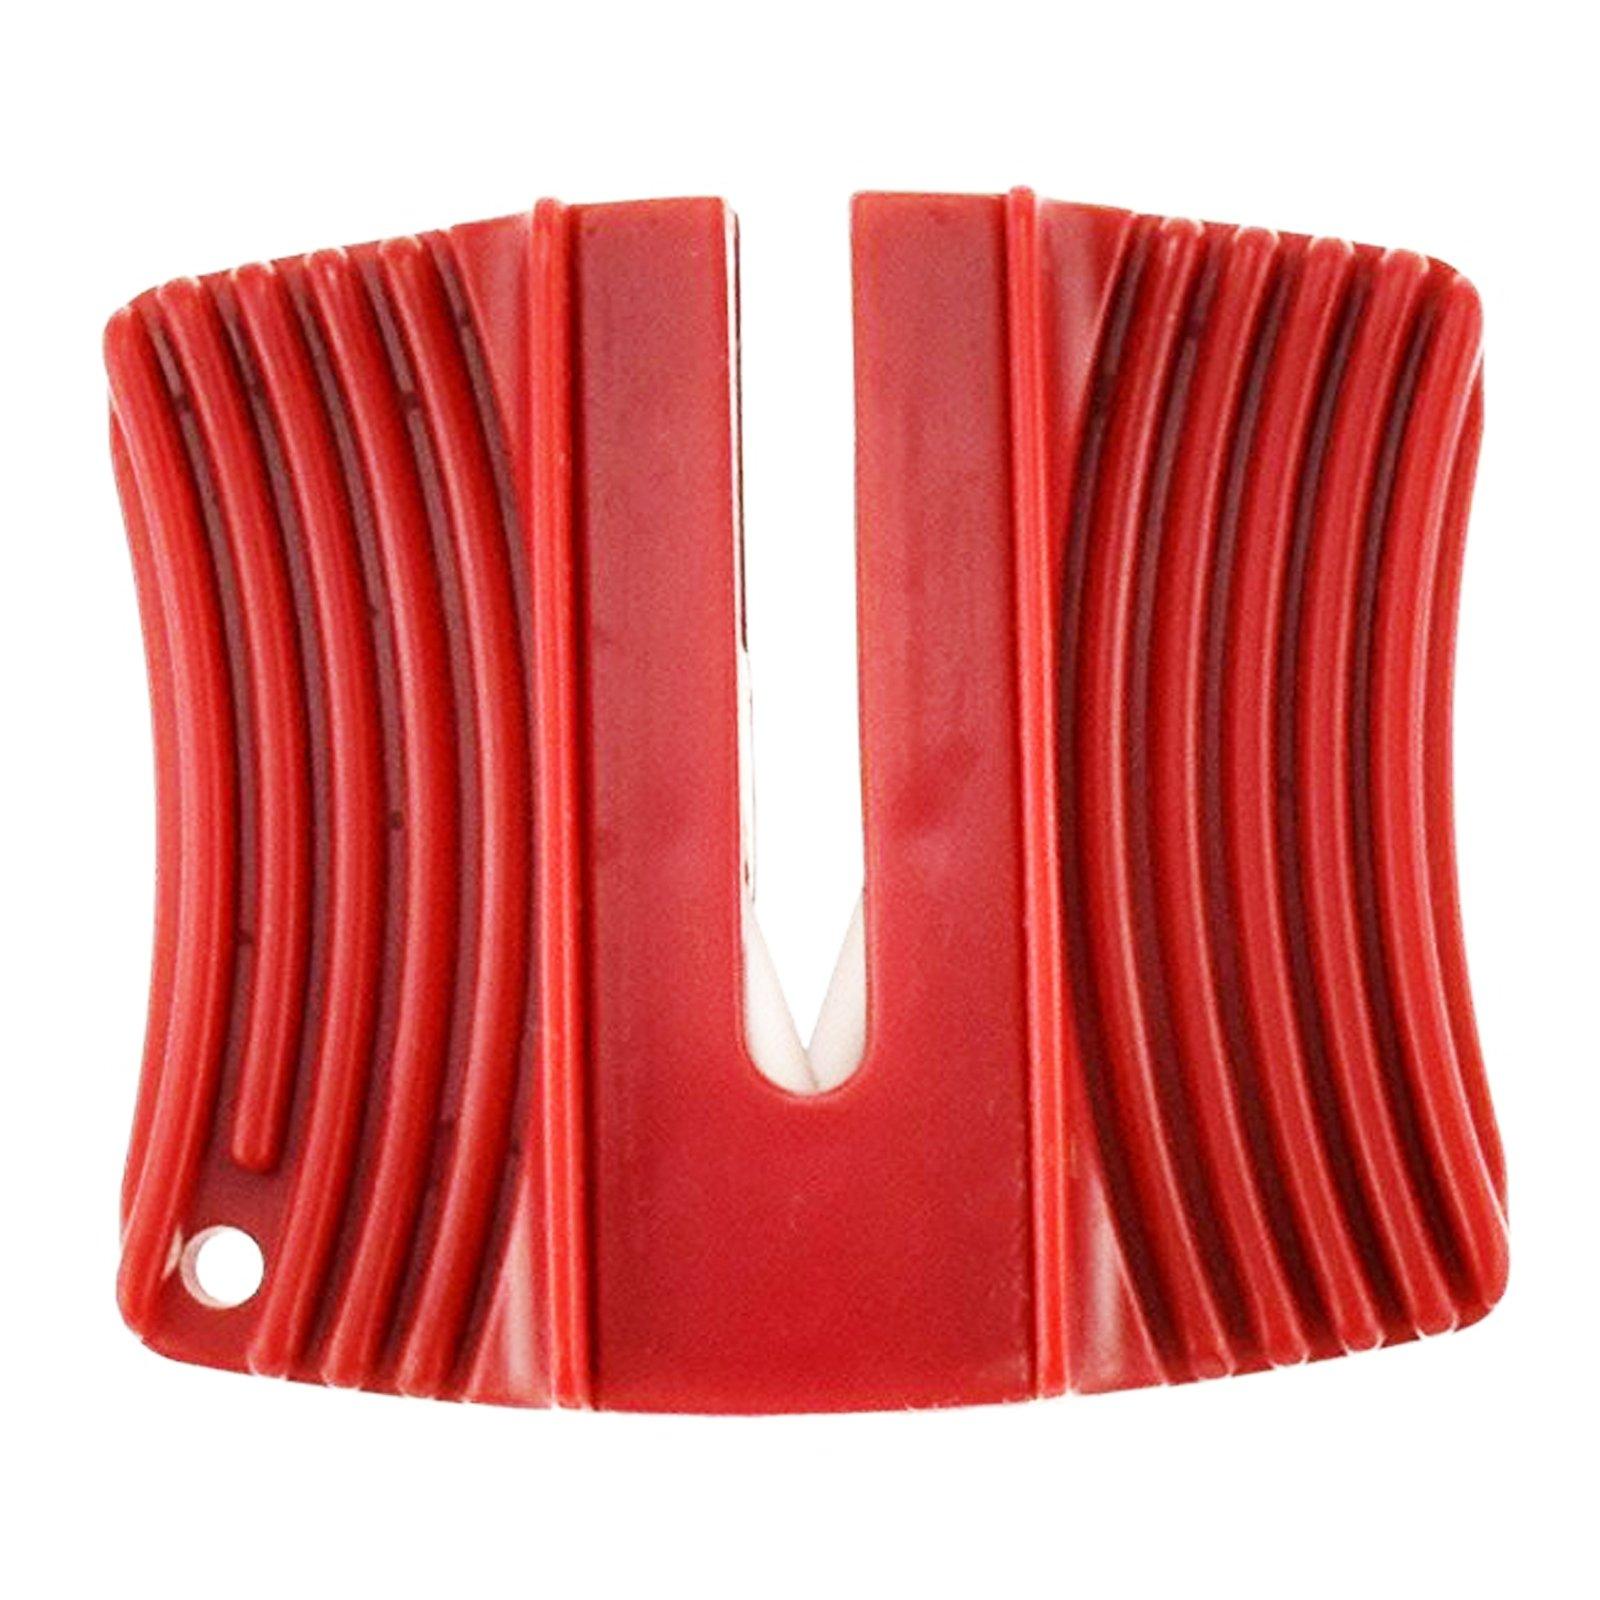 2-1/4 x 2 Ceramic Pocket Sharpener